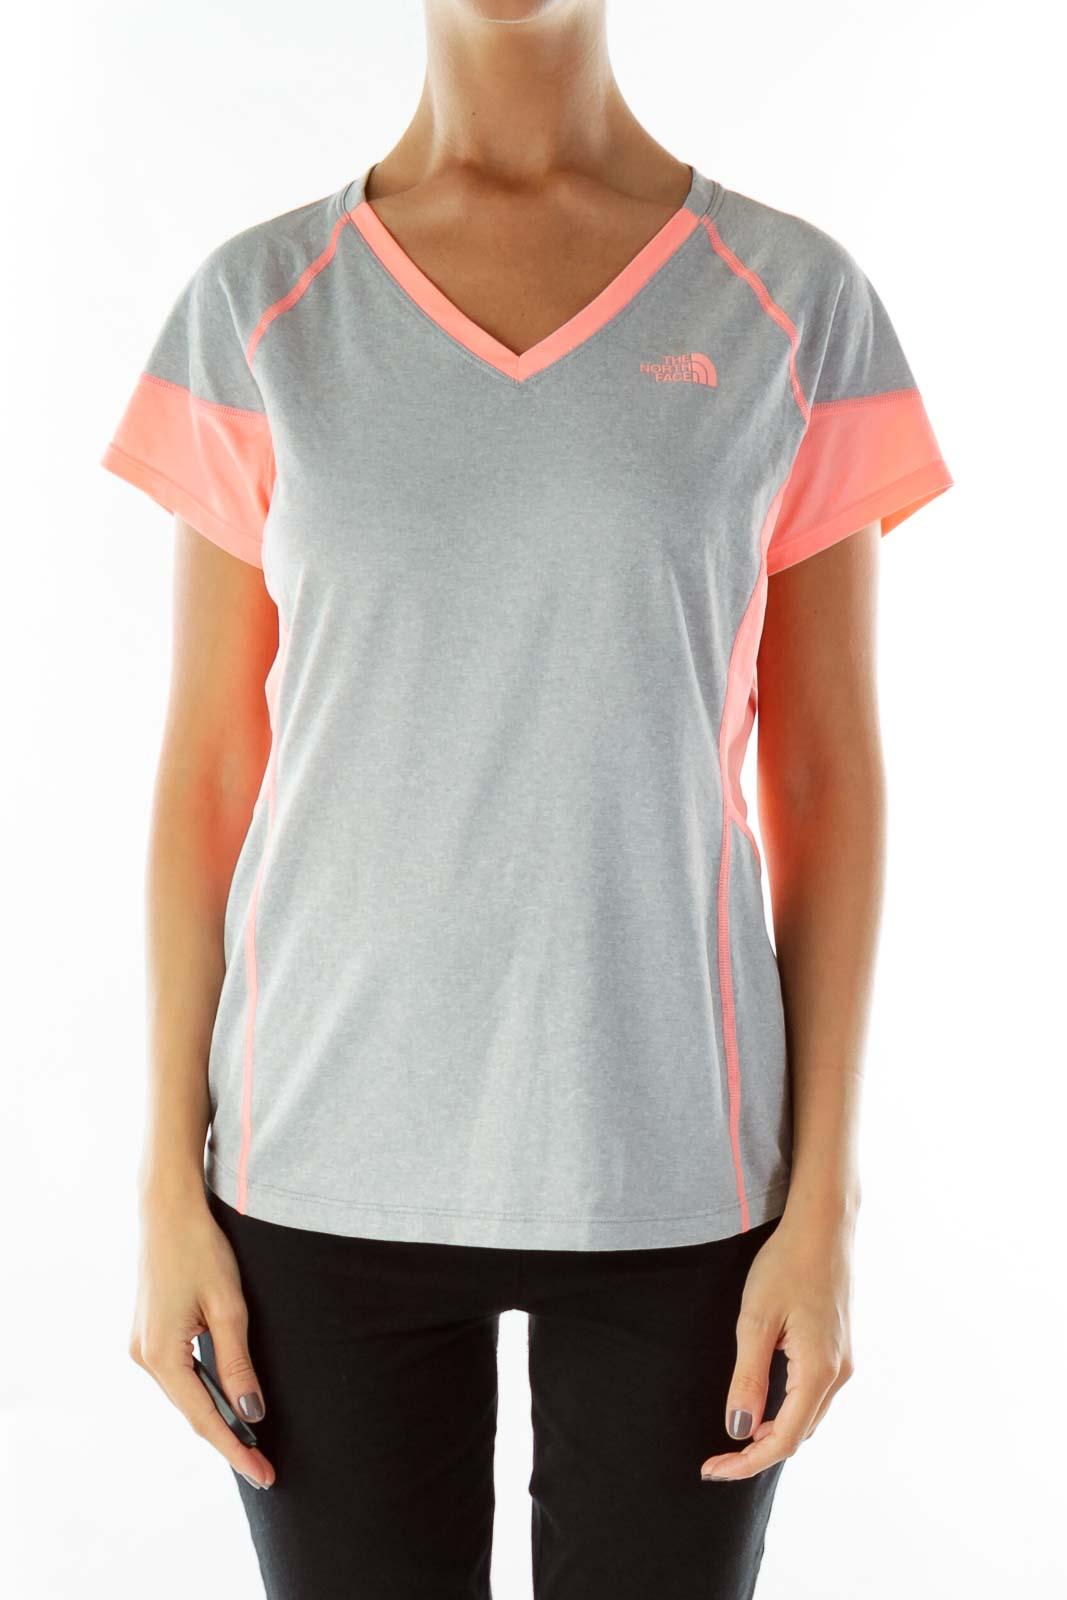 Gray Orange Neon Sports Top